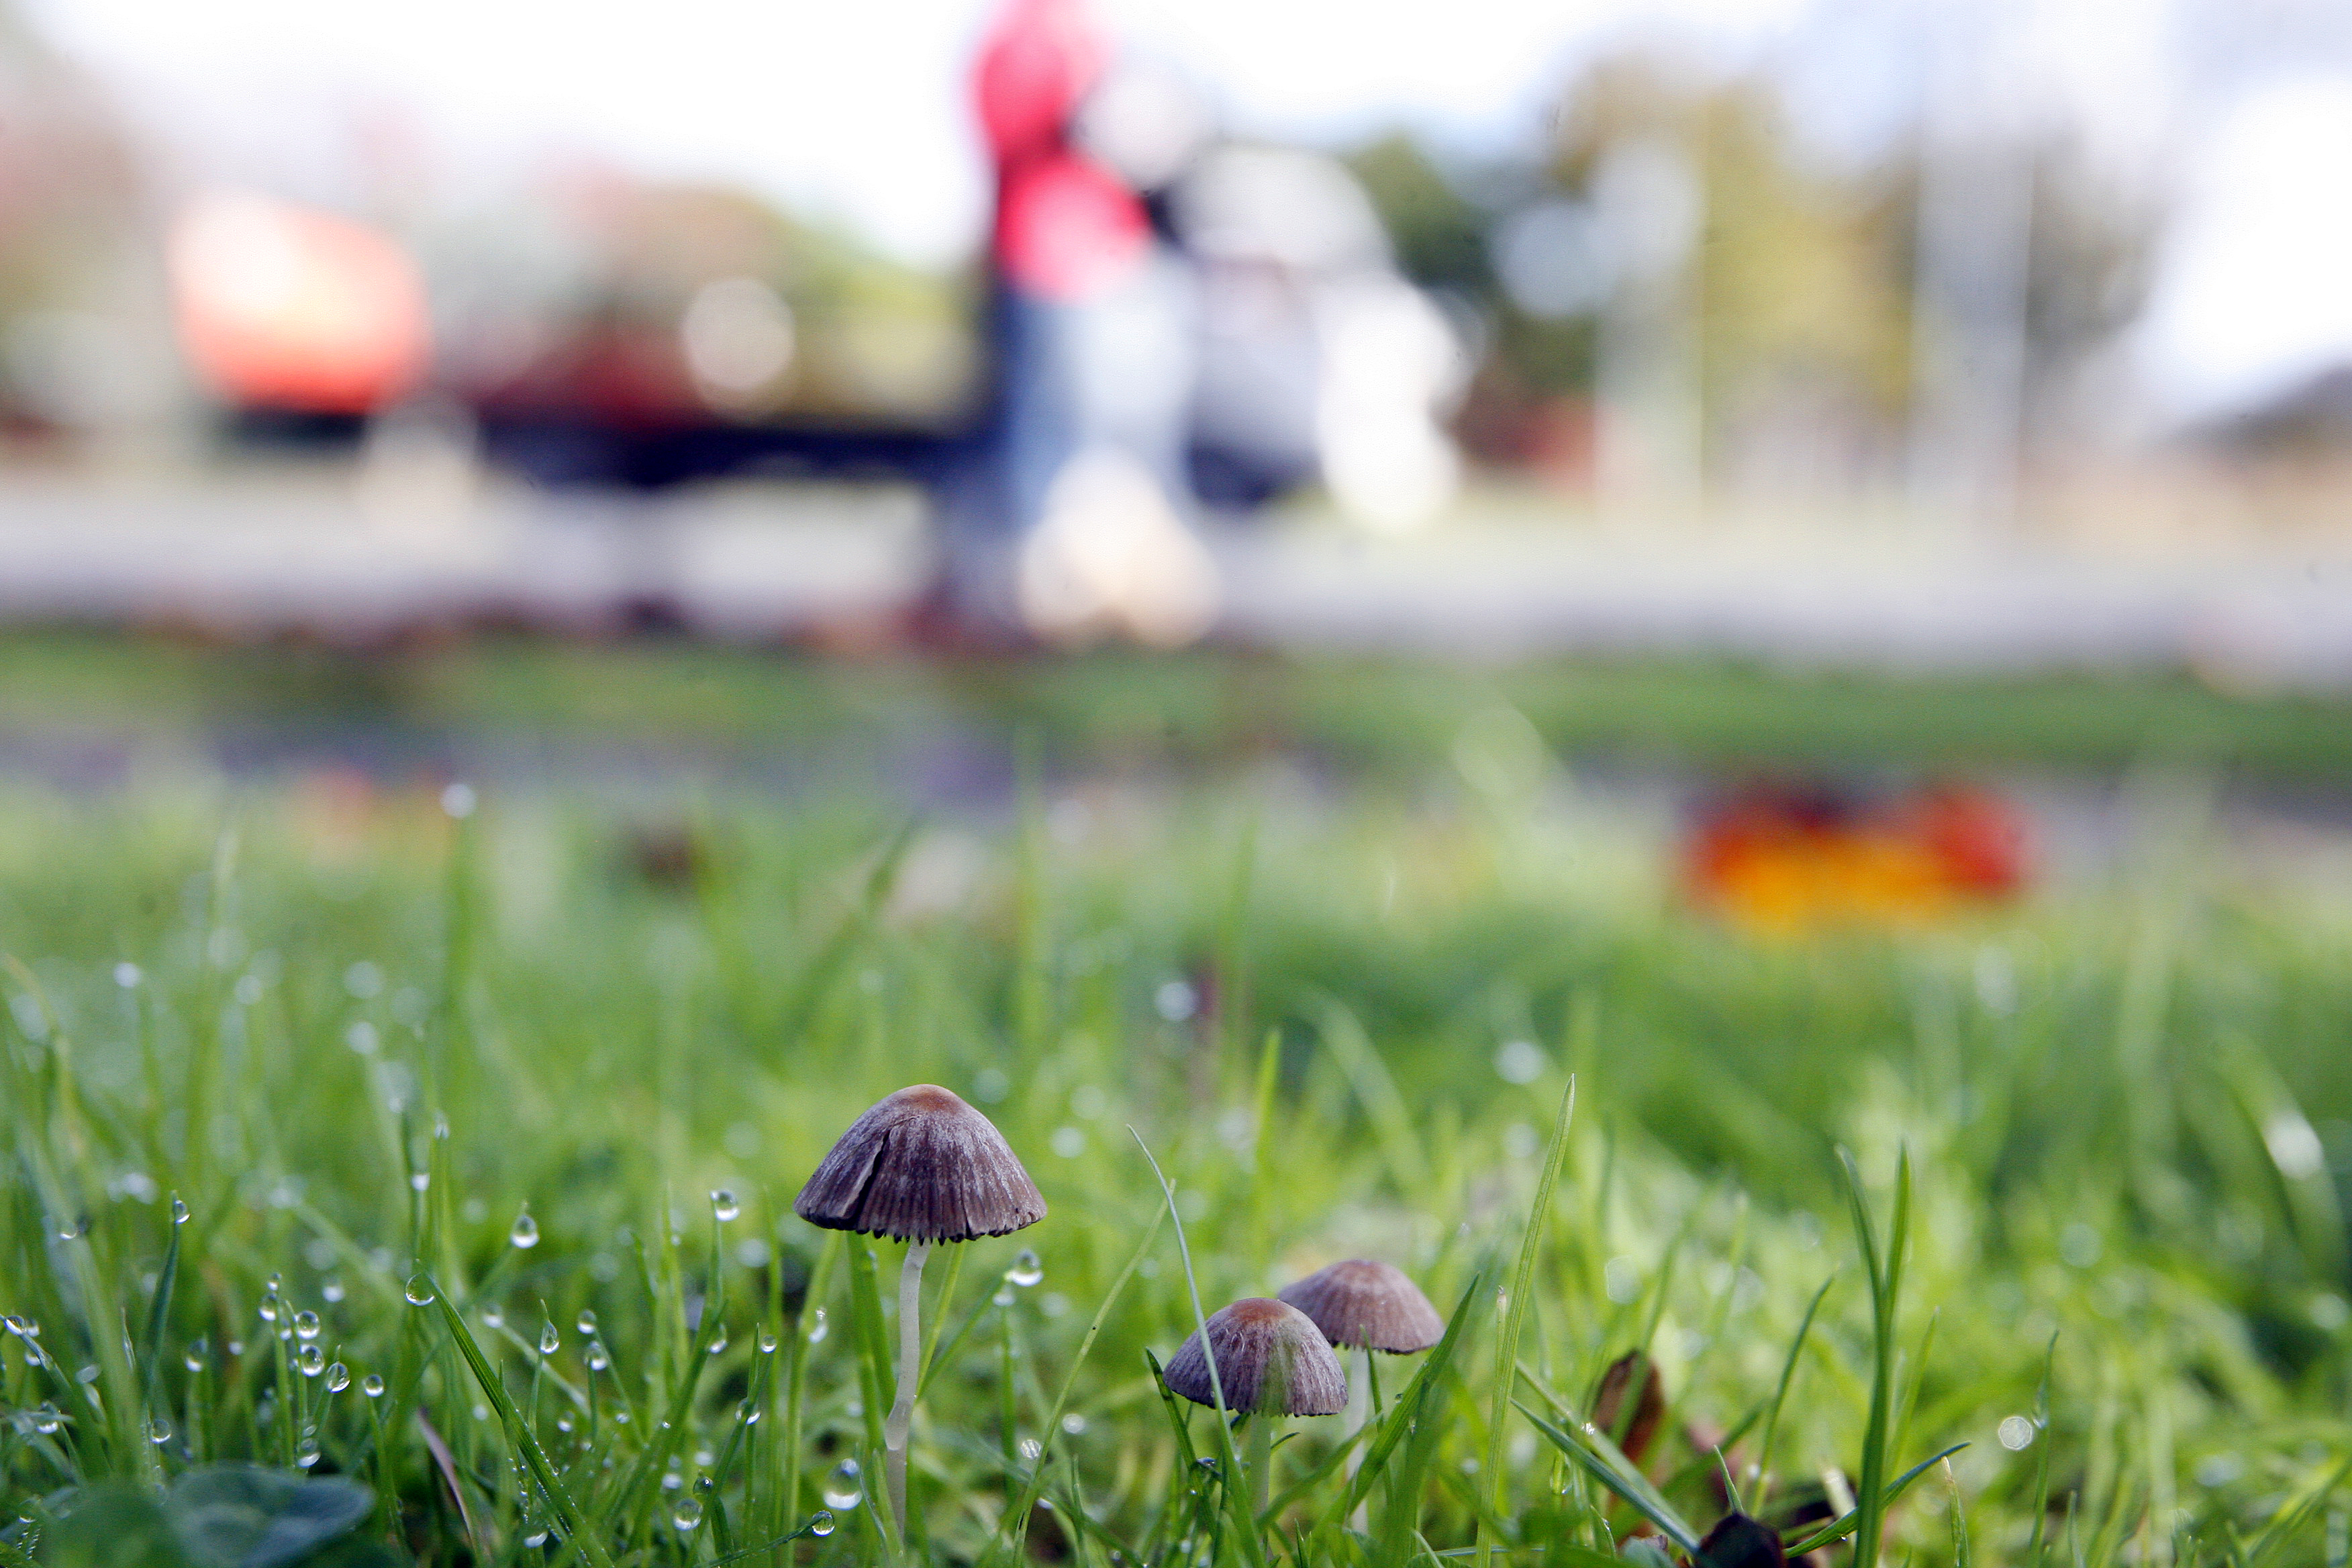 Magic mushrooms land Greymouth man in court - NZ Herald